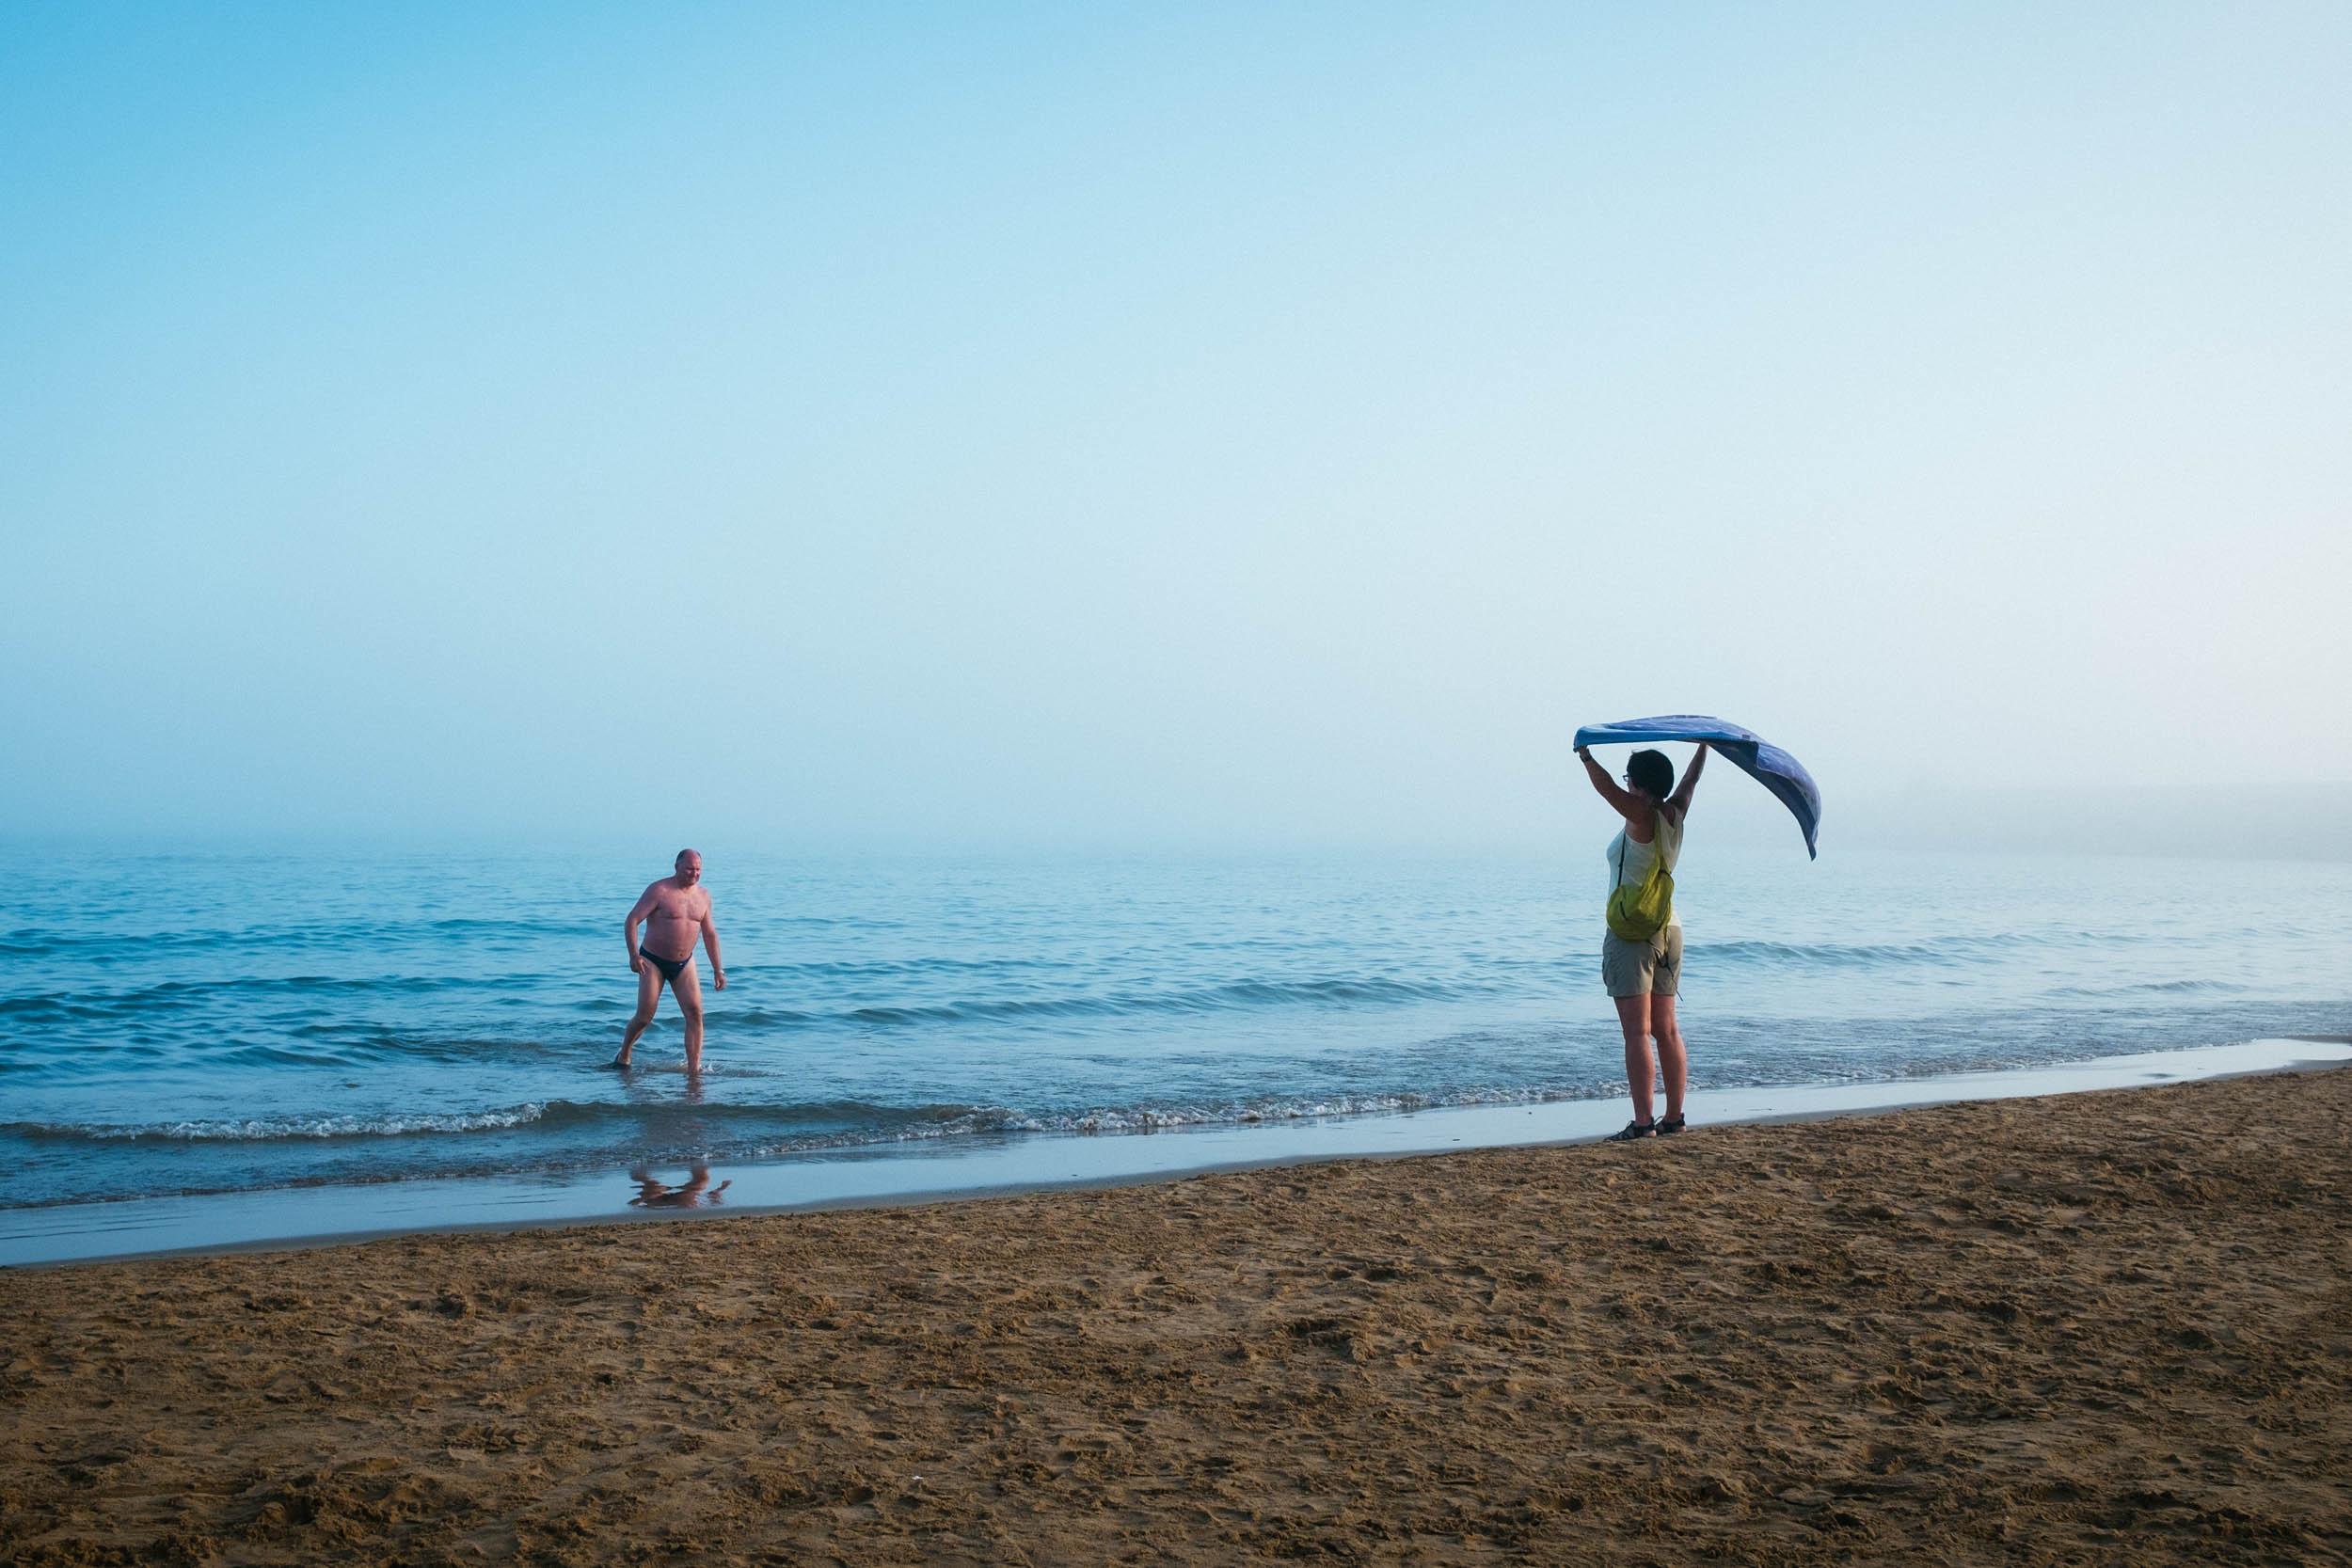 Giuliano-Berti-Lupa-Ragusa-Sicily-Mist-3.jpg